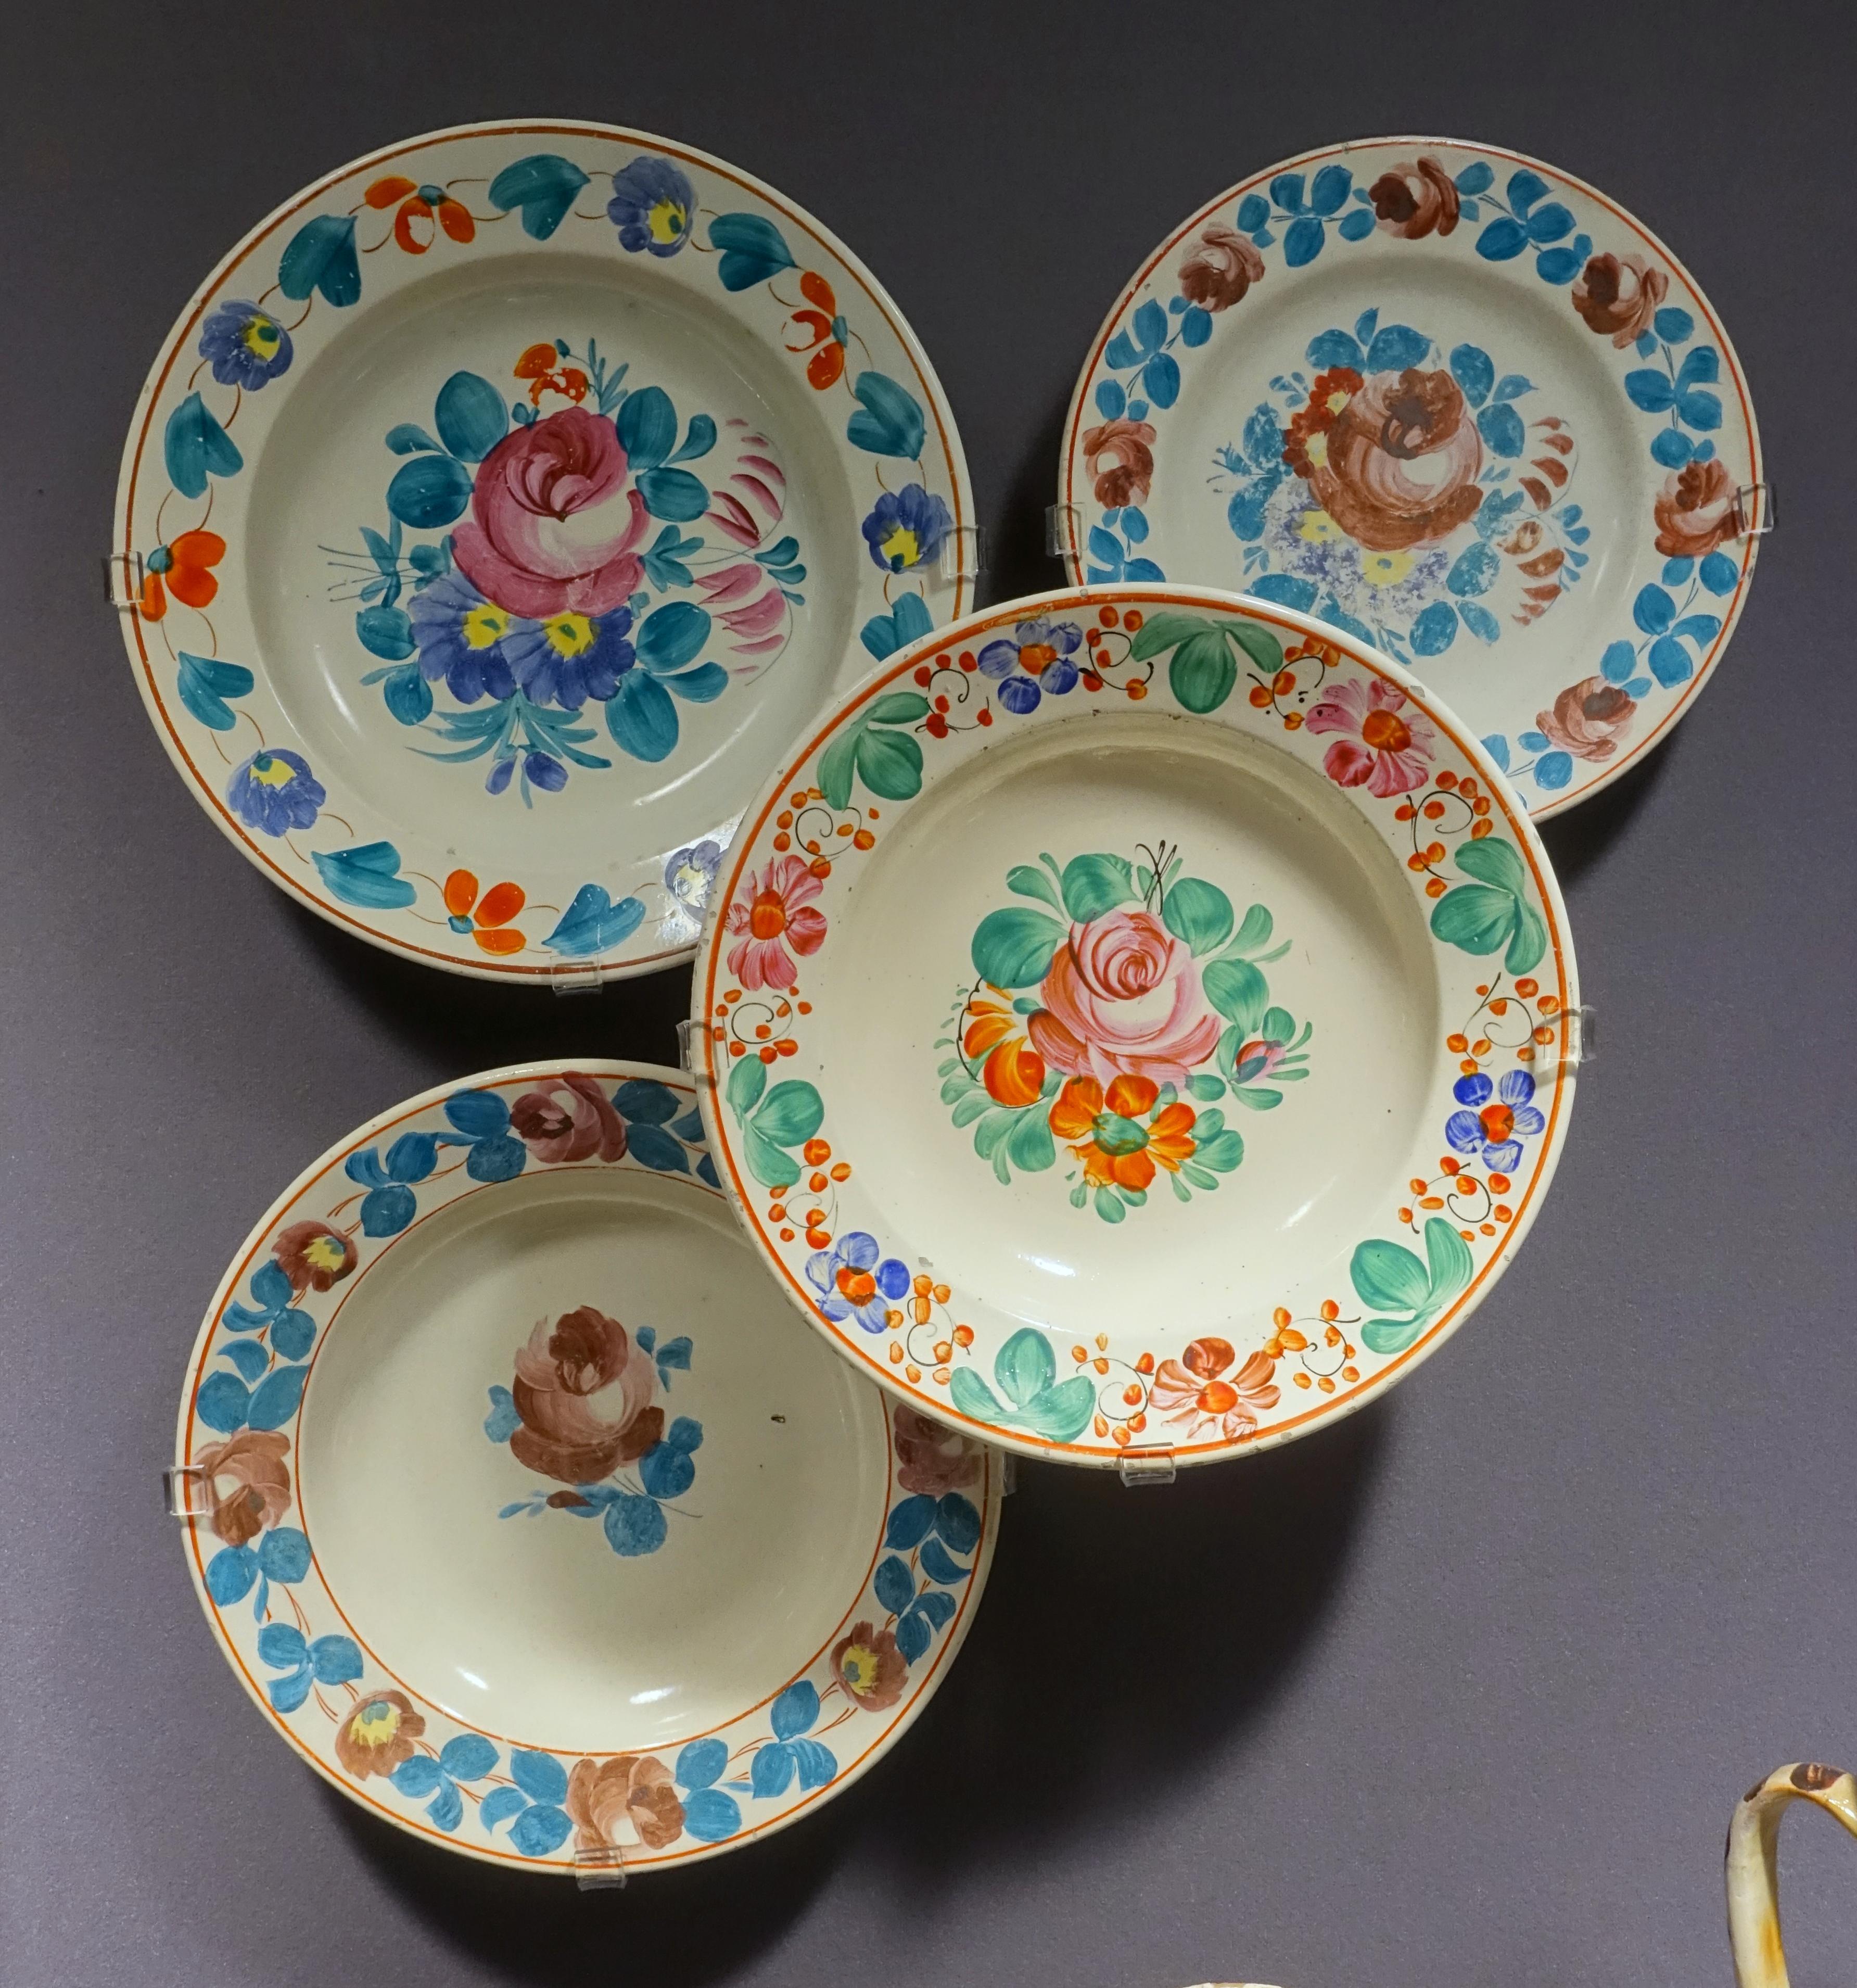 FileFour Plates Hungary Murany Late 1800s Ceramic - Museum Of & Hungarian Dinnerware Sets u0026 Download Artistic Hungarian Handmade ...